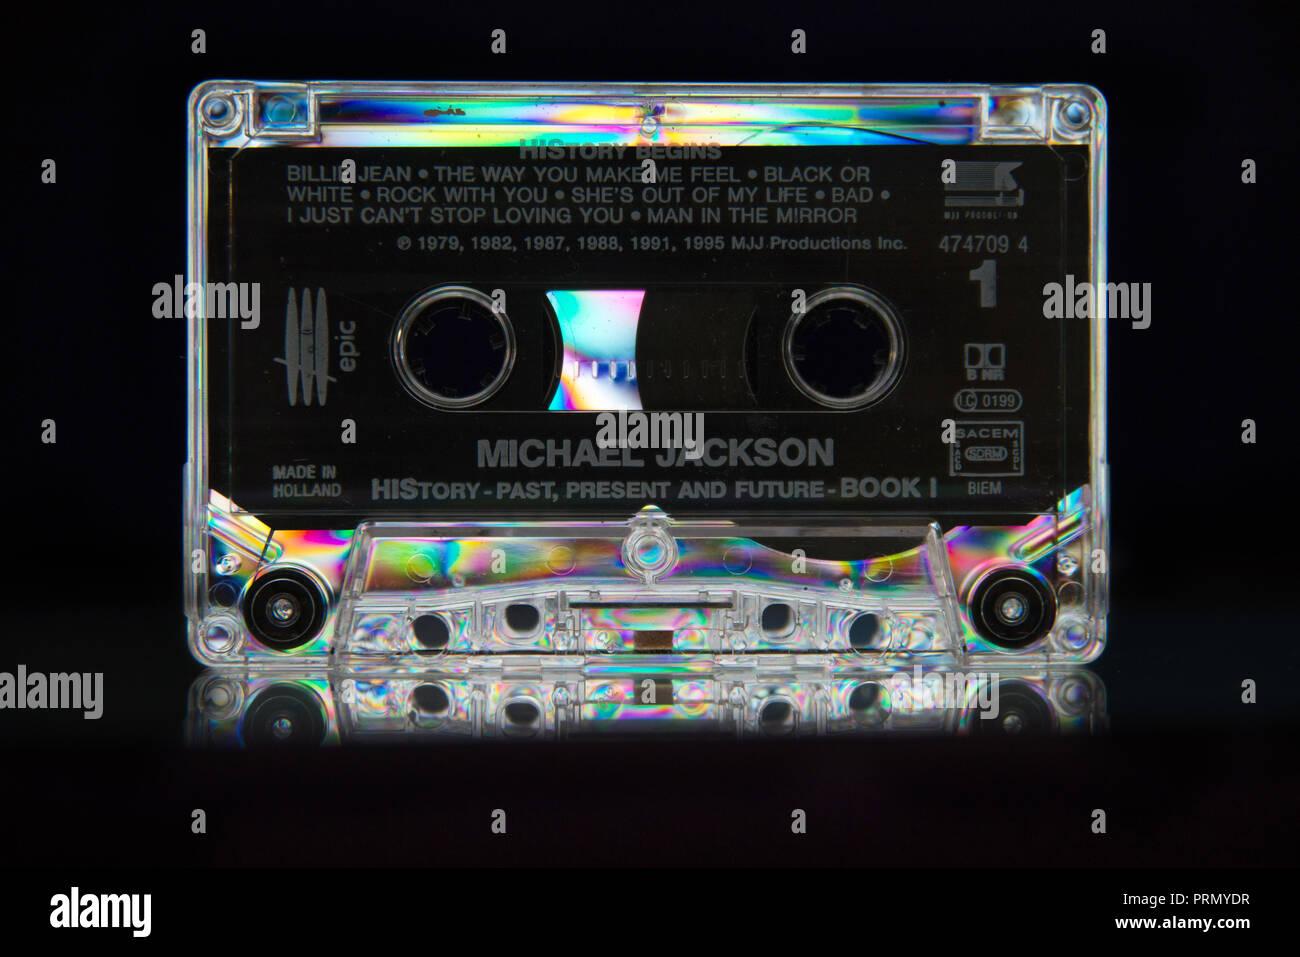 Michael Jackson History Cassette Tape - Stock Image